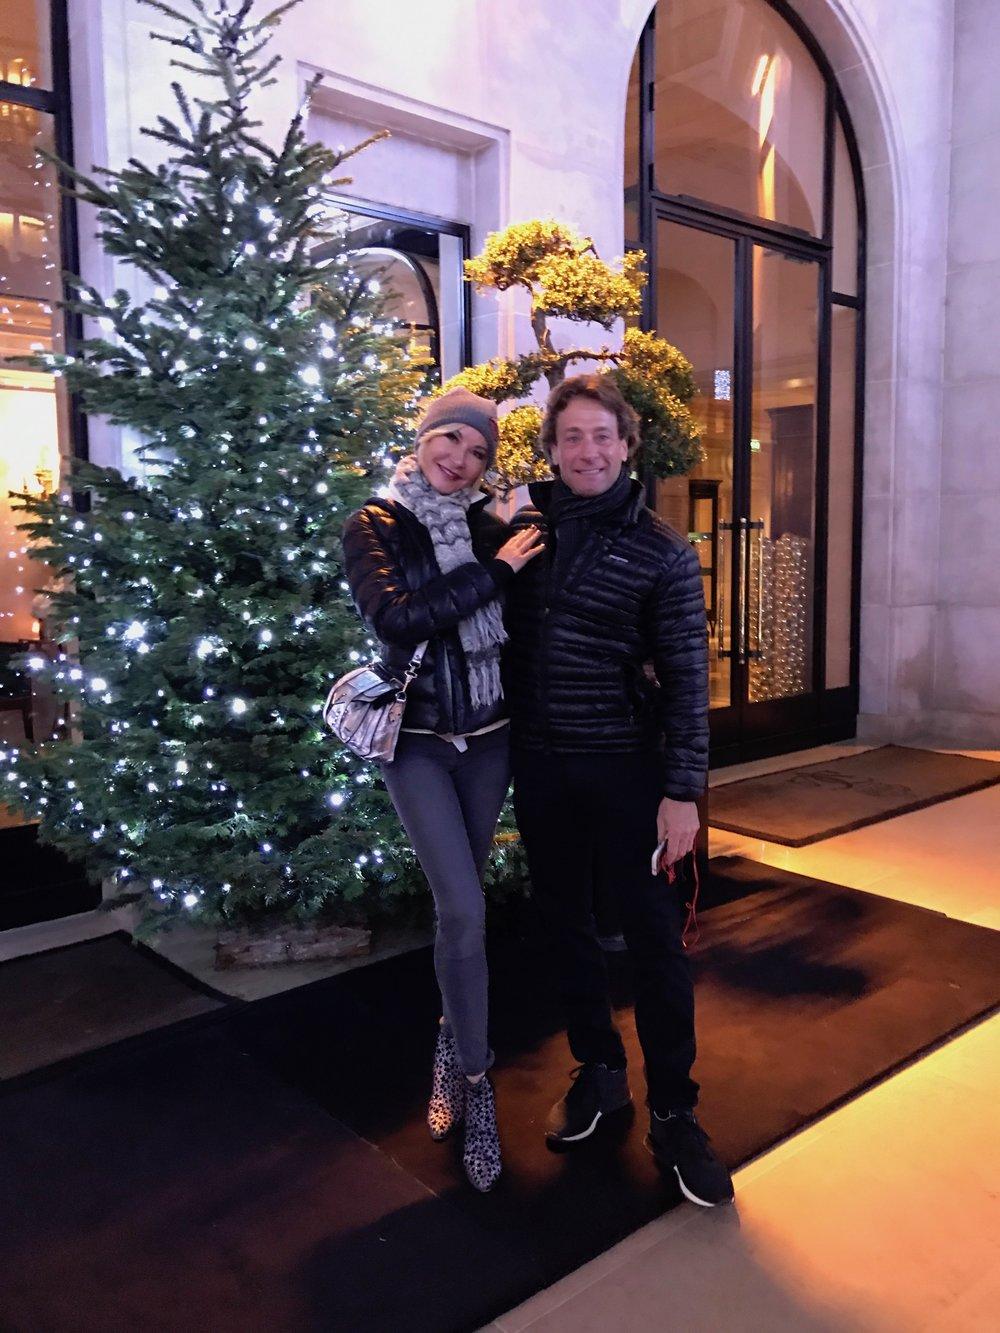 Christmas 🎄 in Paris